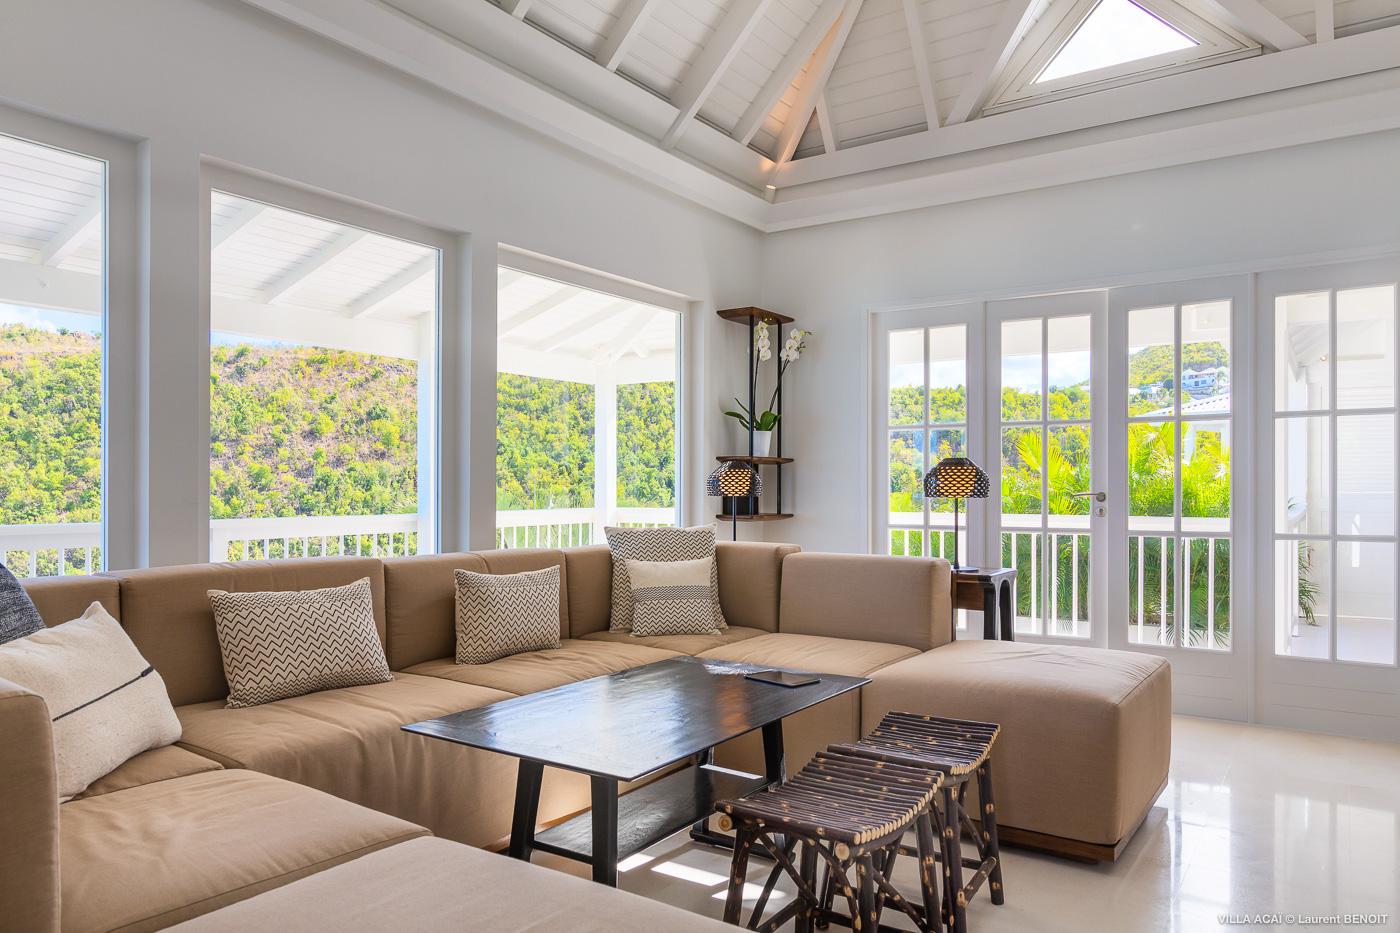 Villa Acai - Bright Villa Rental St Barth with Beautiful View on Flamands Beach - Living room